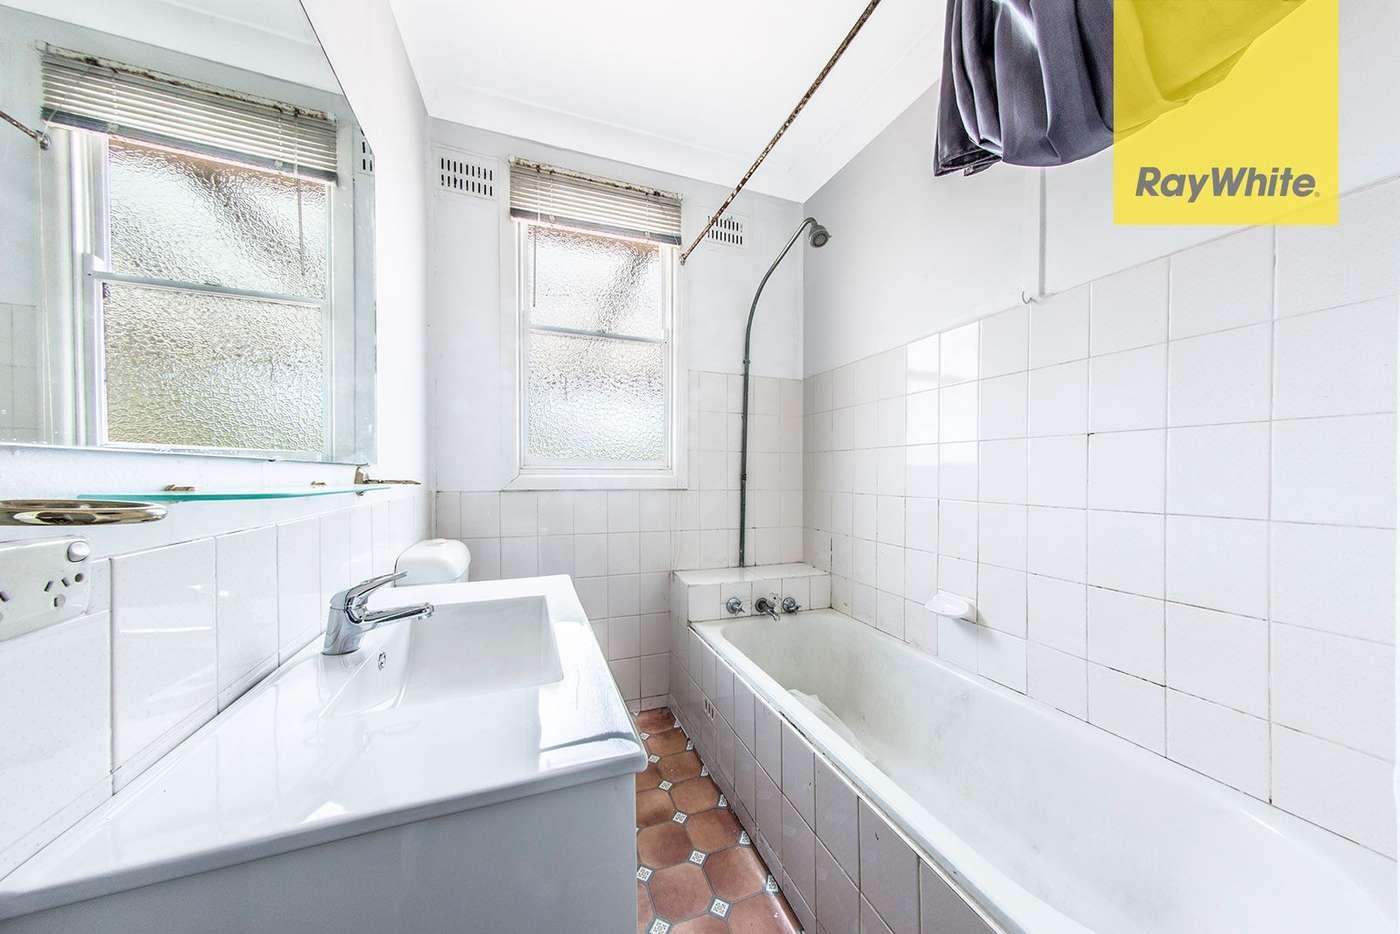 Sixth view of Homely house listing, 15 Glenn Avenue, Northmead NSW 2152